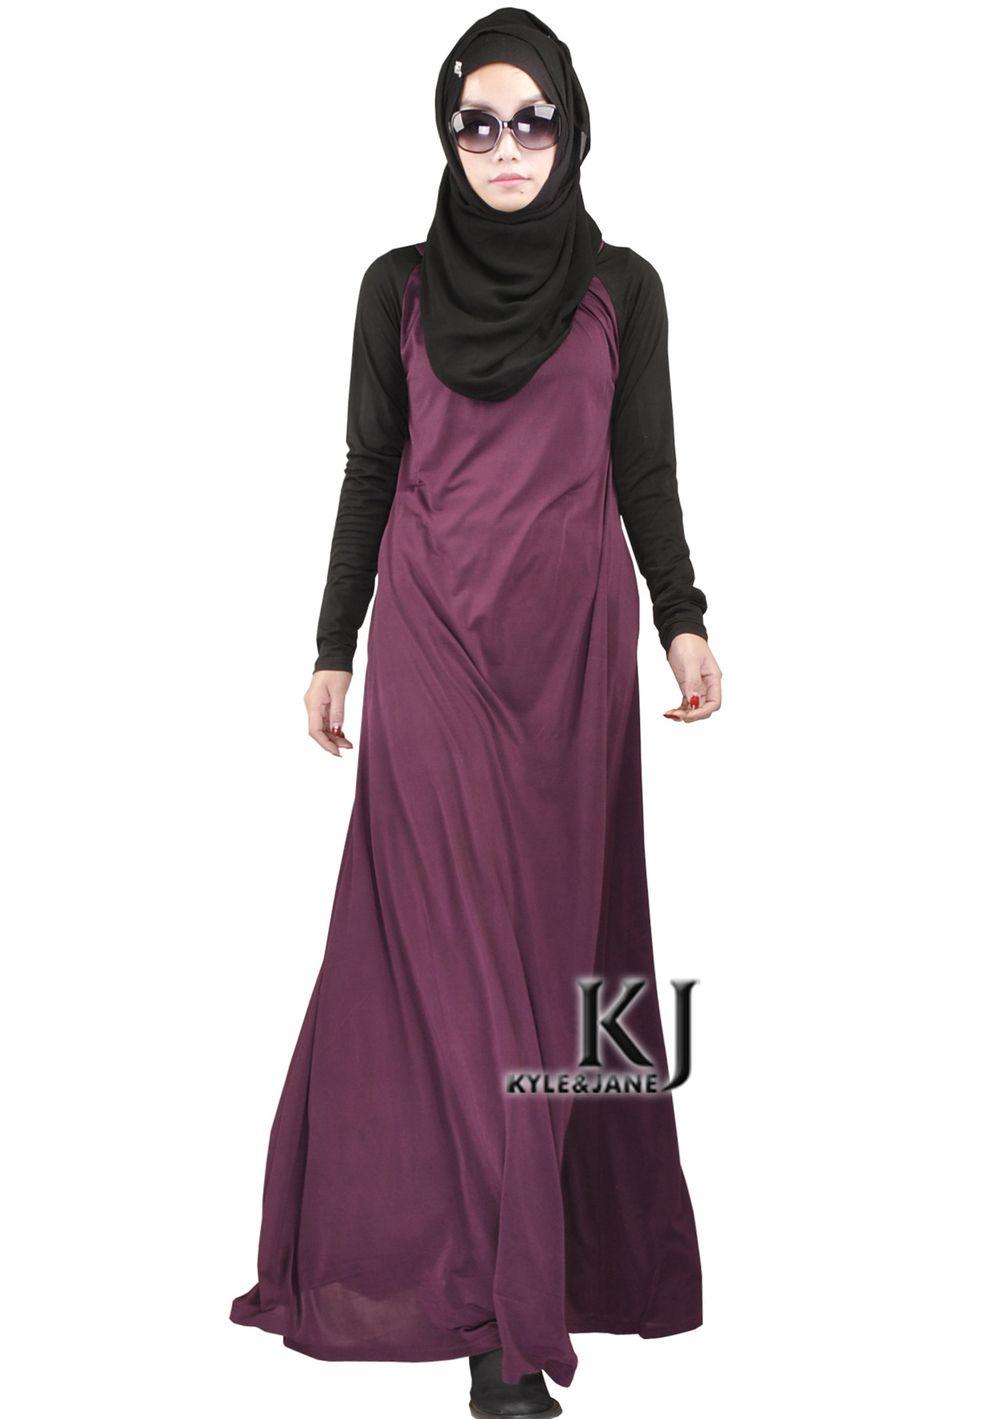 36def3726952 Fashion Muslim Dress Abaya in Dubai Islamic Clothing For Women Jilbab  Djellaba Robe Musulmane Turkish Women Clothing Side Pocket #Islamic clothing